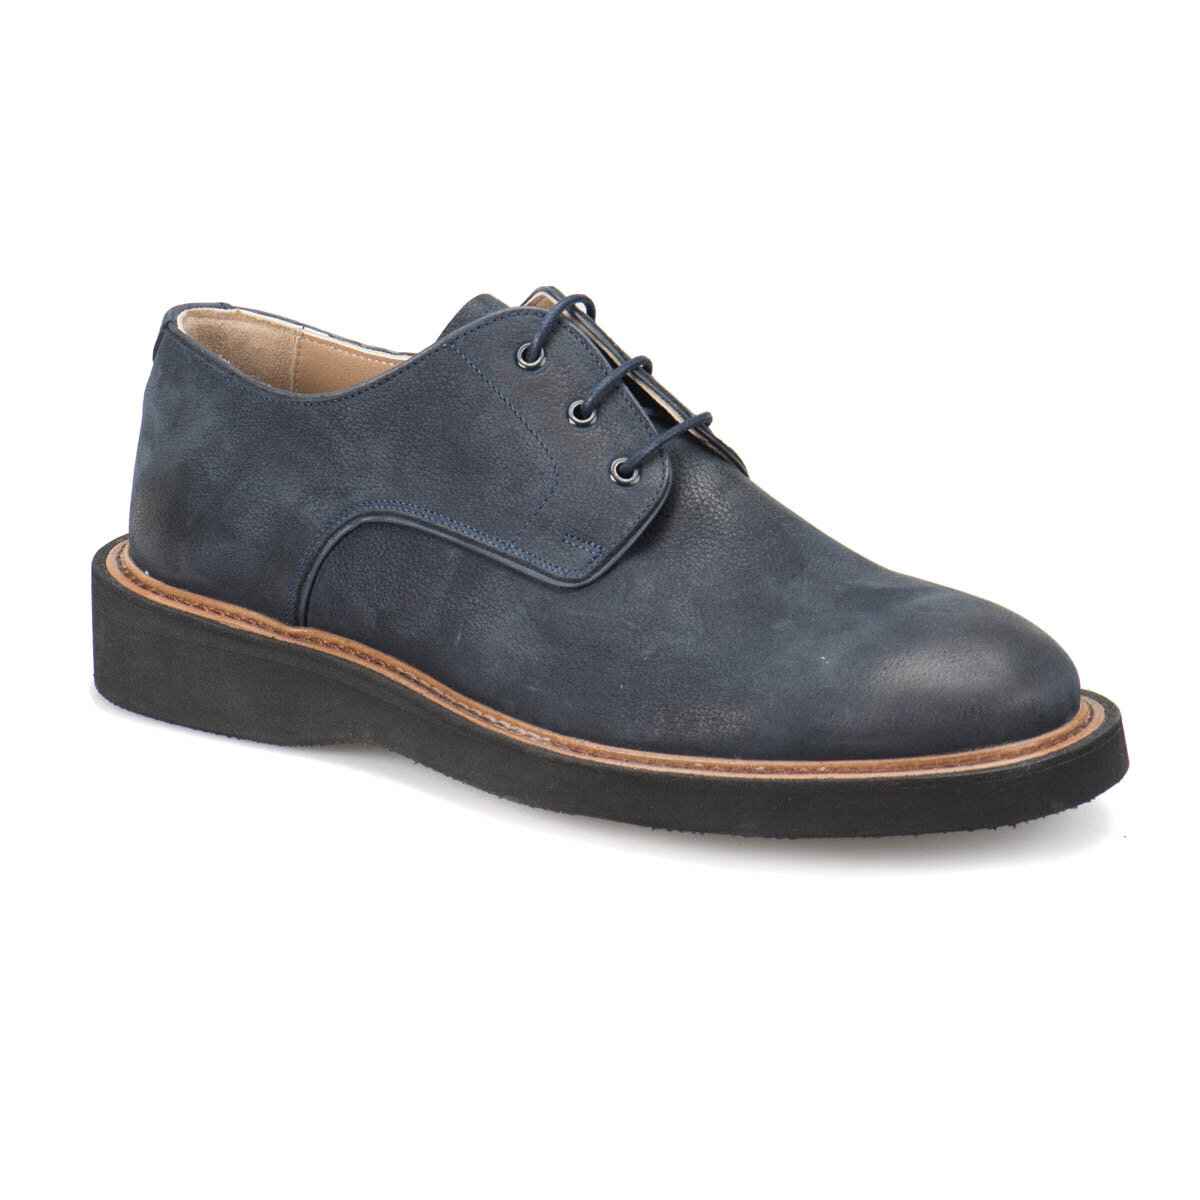 FLO 2495 Navy Blue Men 'S Classic Shoes Garamond